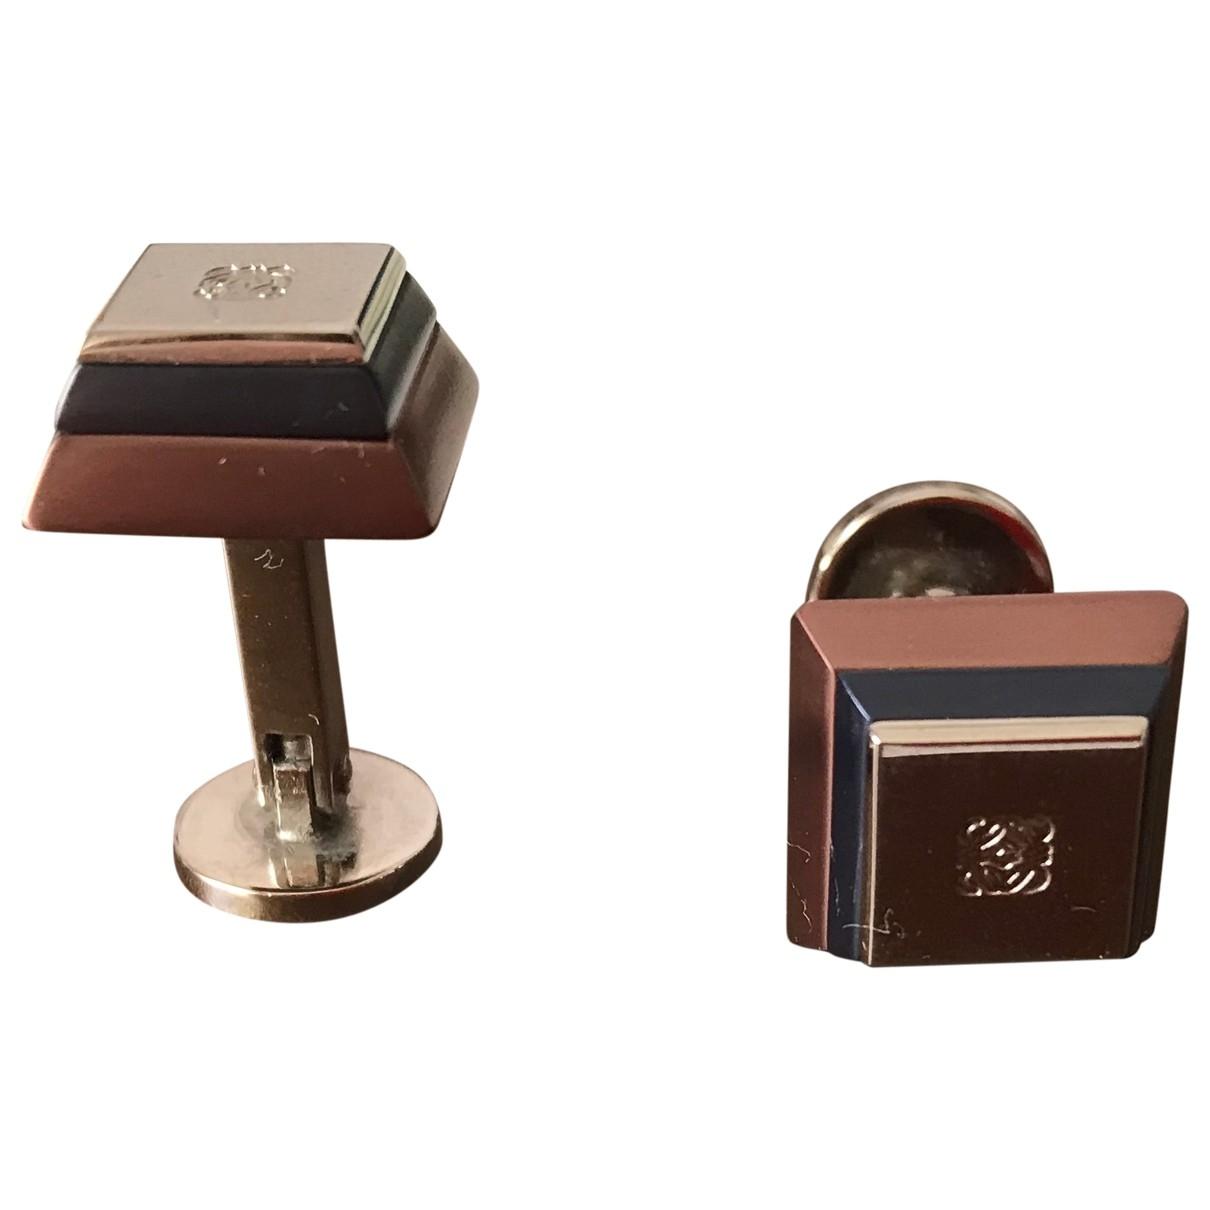 Loewe \N Manschettenknopfe in  Metallic Silber